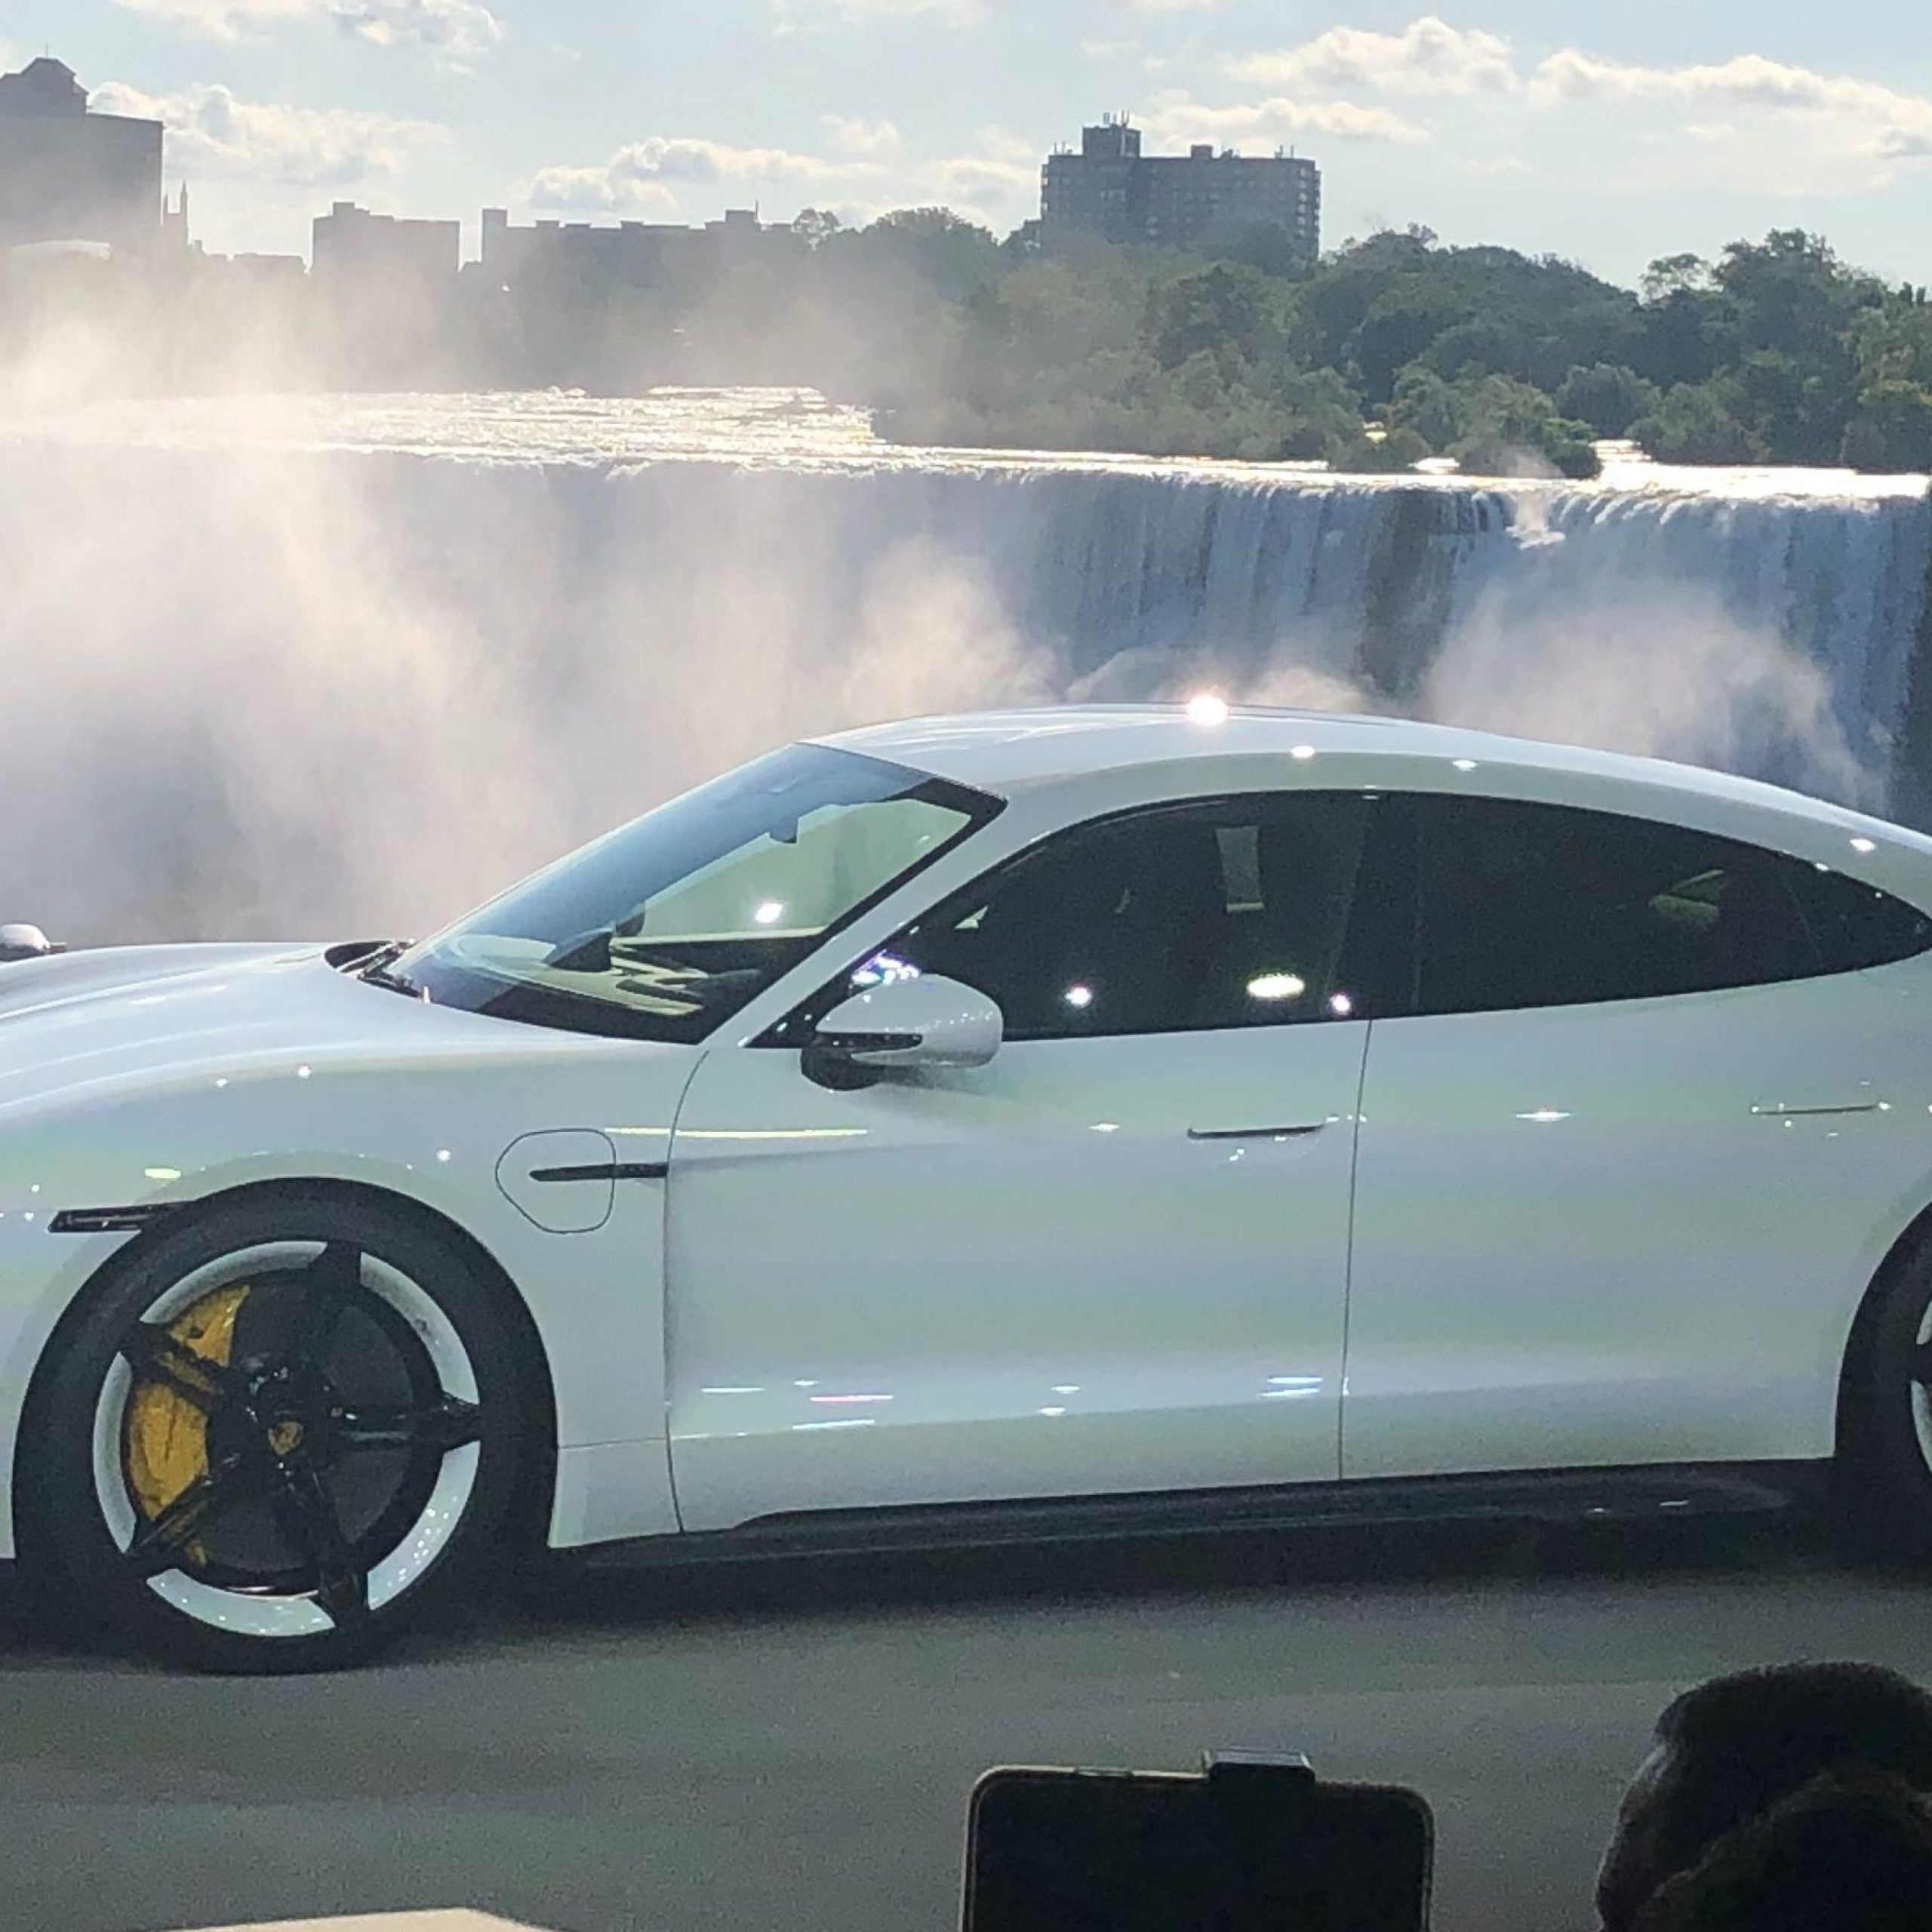 Porsche-Taycan-e1567603729713-scaled.jpg